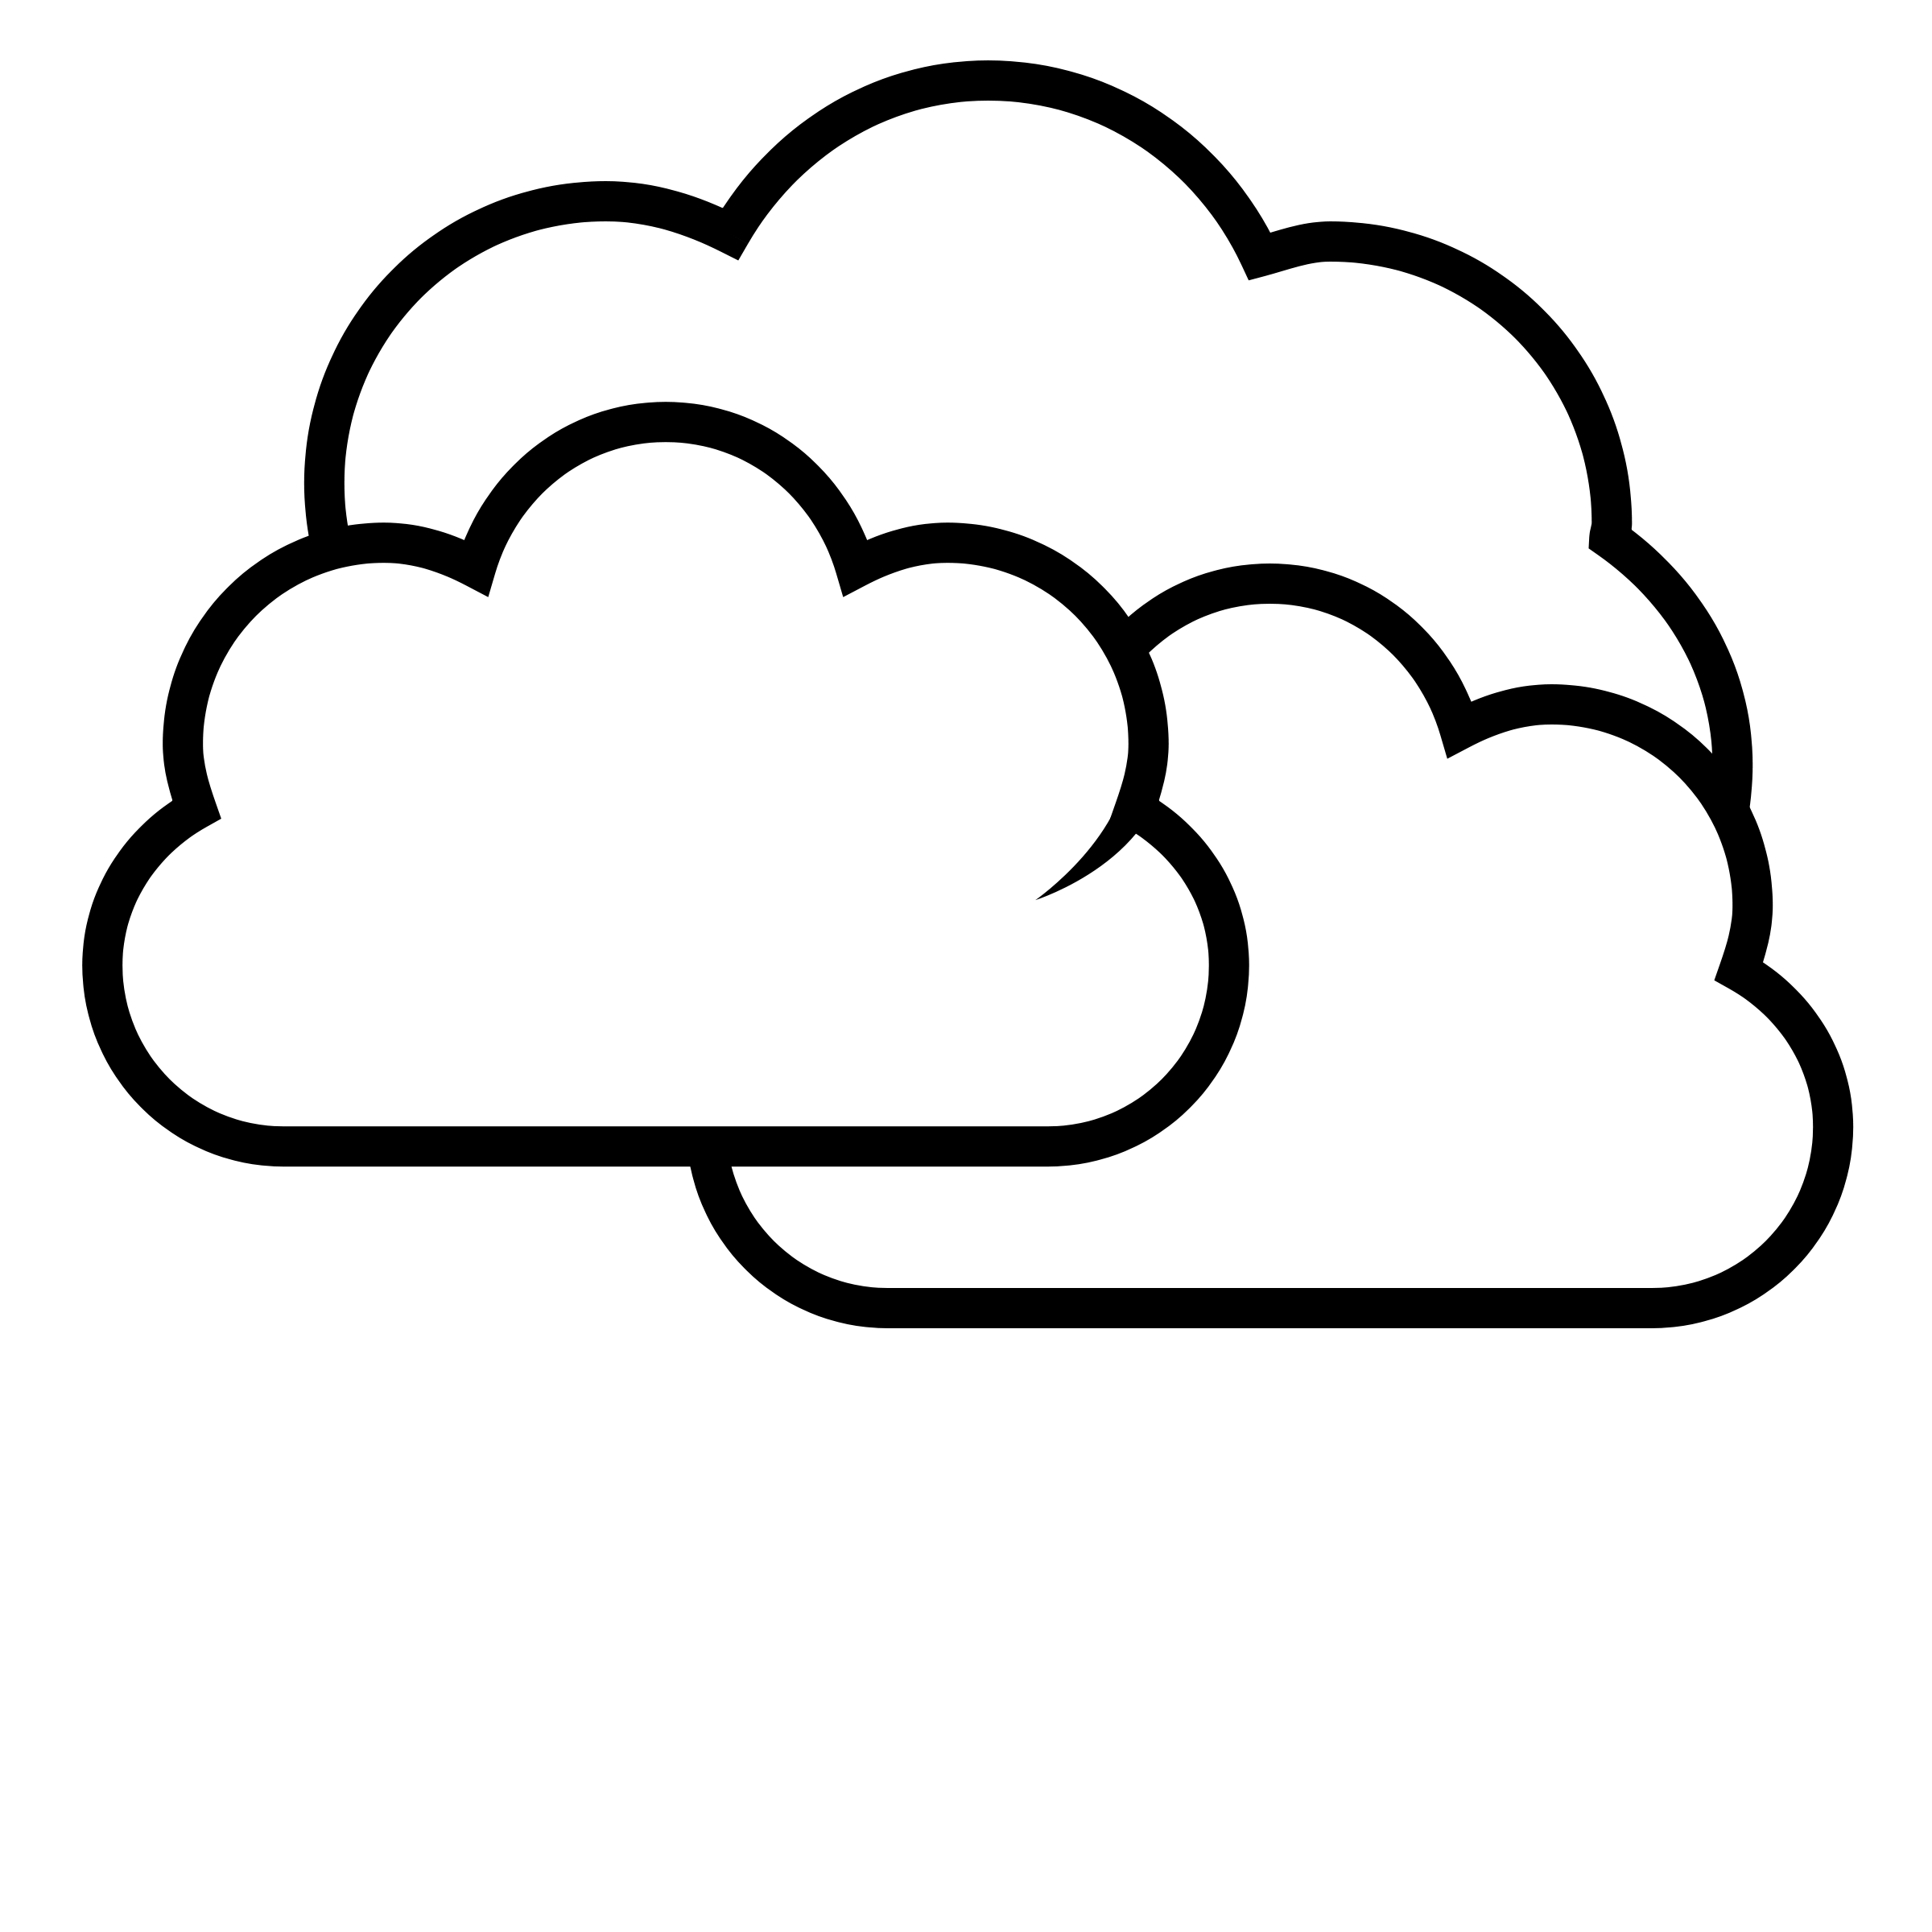 Cloudy Clipart & Cloudy Clip Art Images.